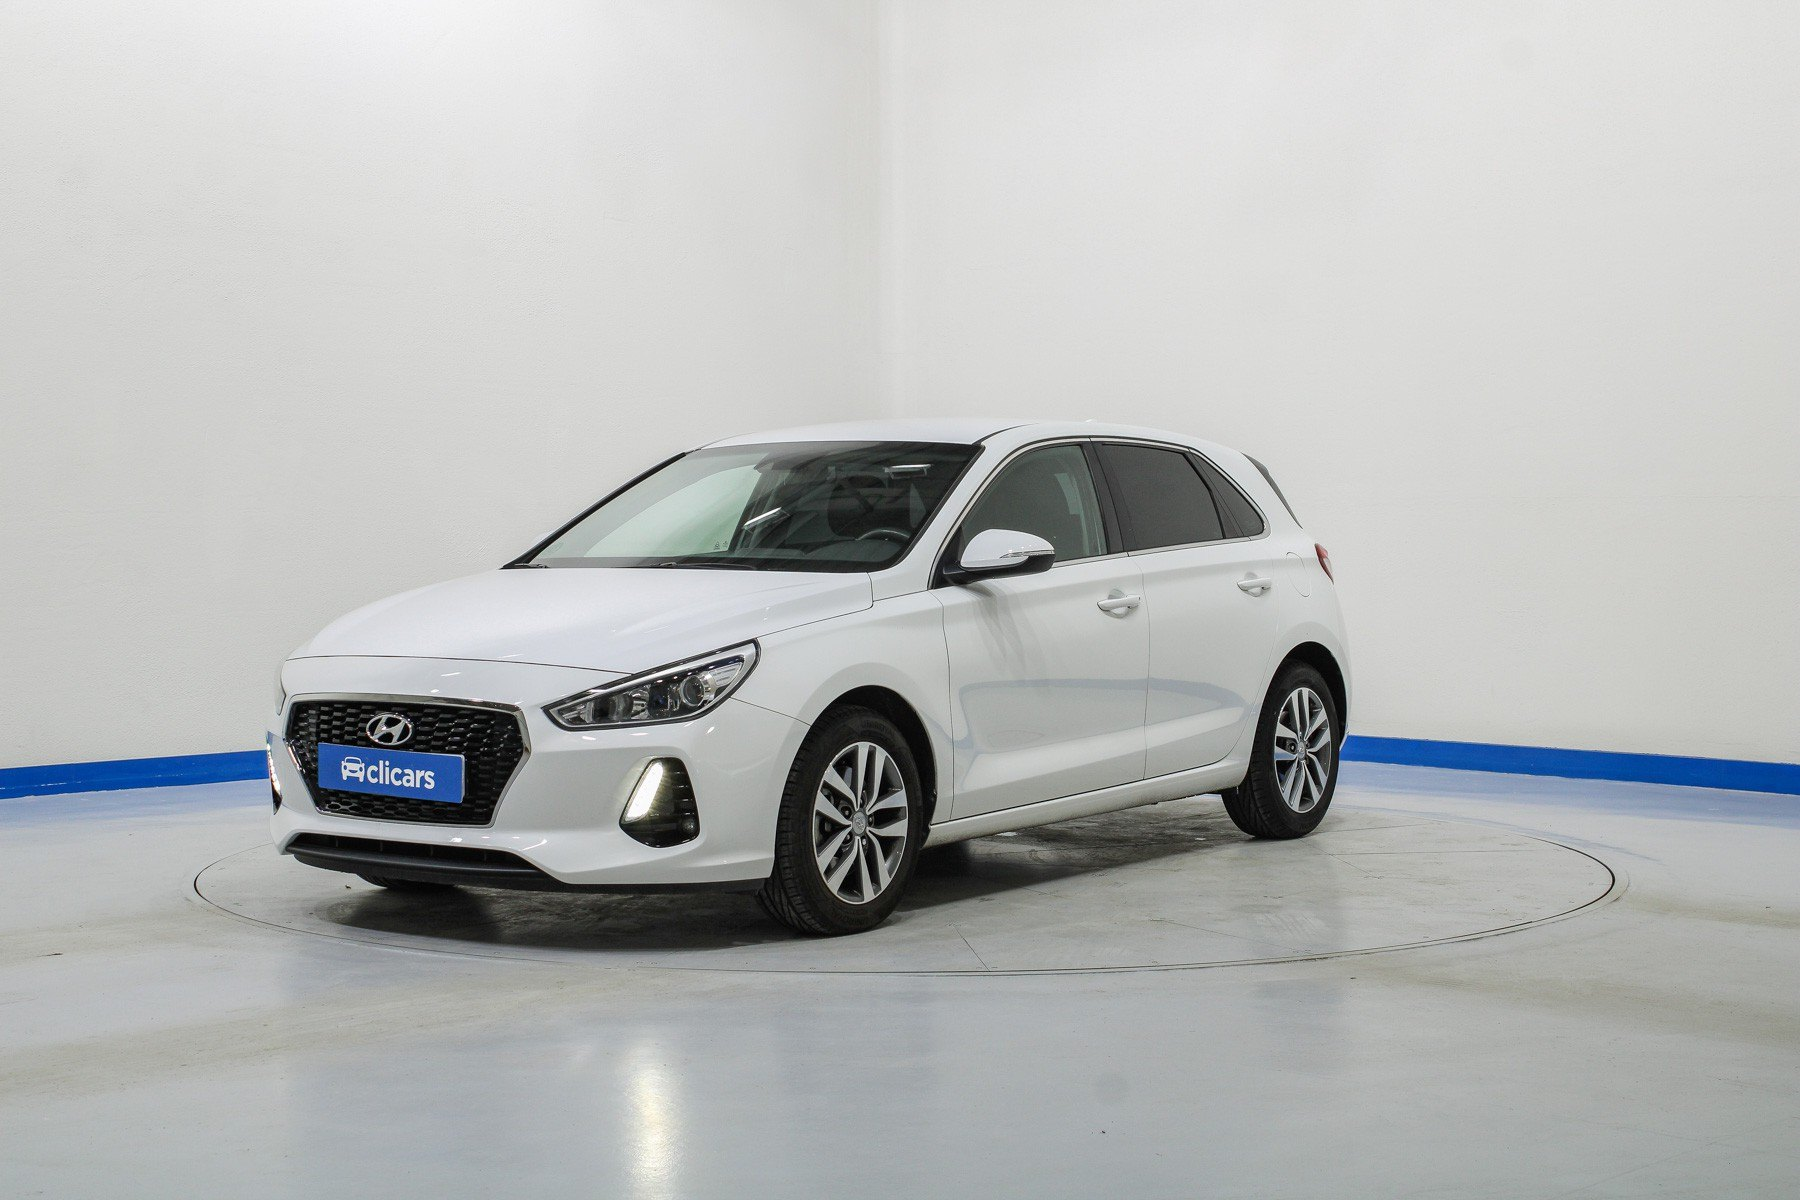 Hyundai i30 Diésel 1.6 CRDi 81kW (110CV) Tecno 1